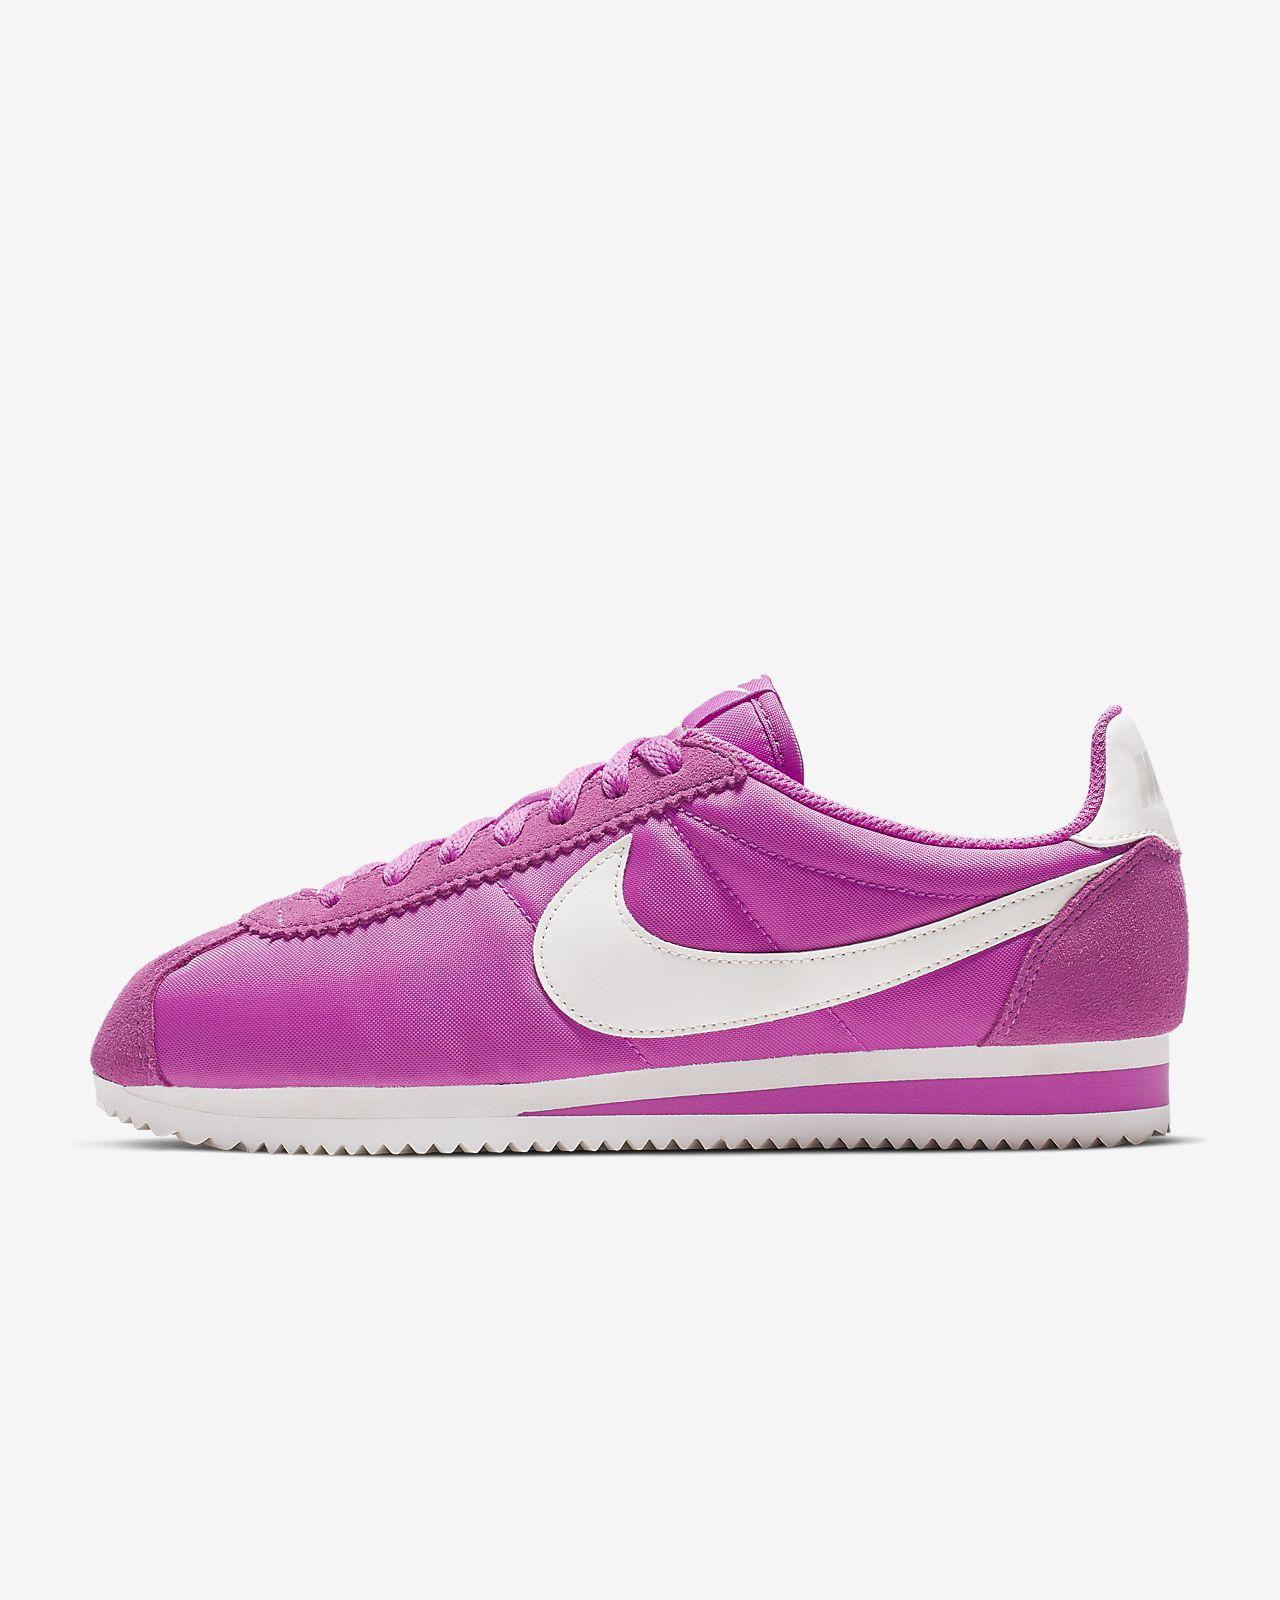 timeless design b3b61 f2f20 ... Chaussure Nike Classic Cortez Nylon pour Femme